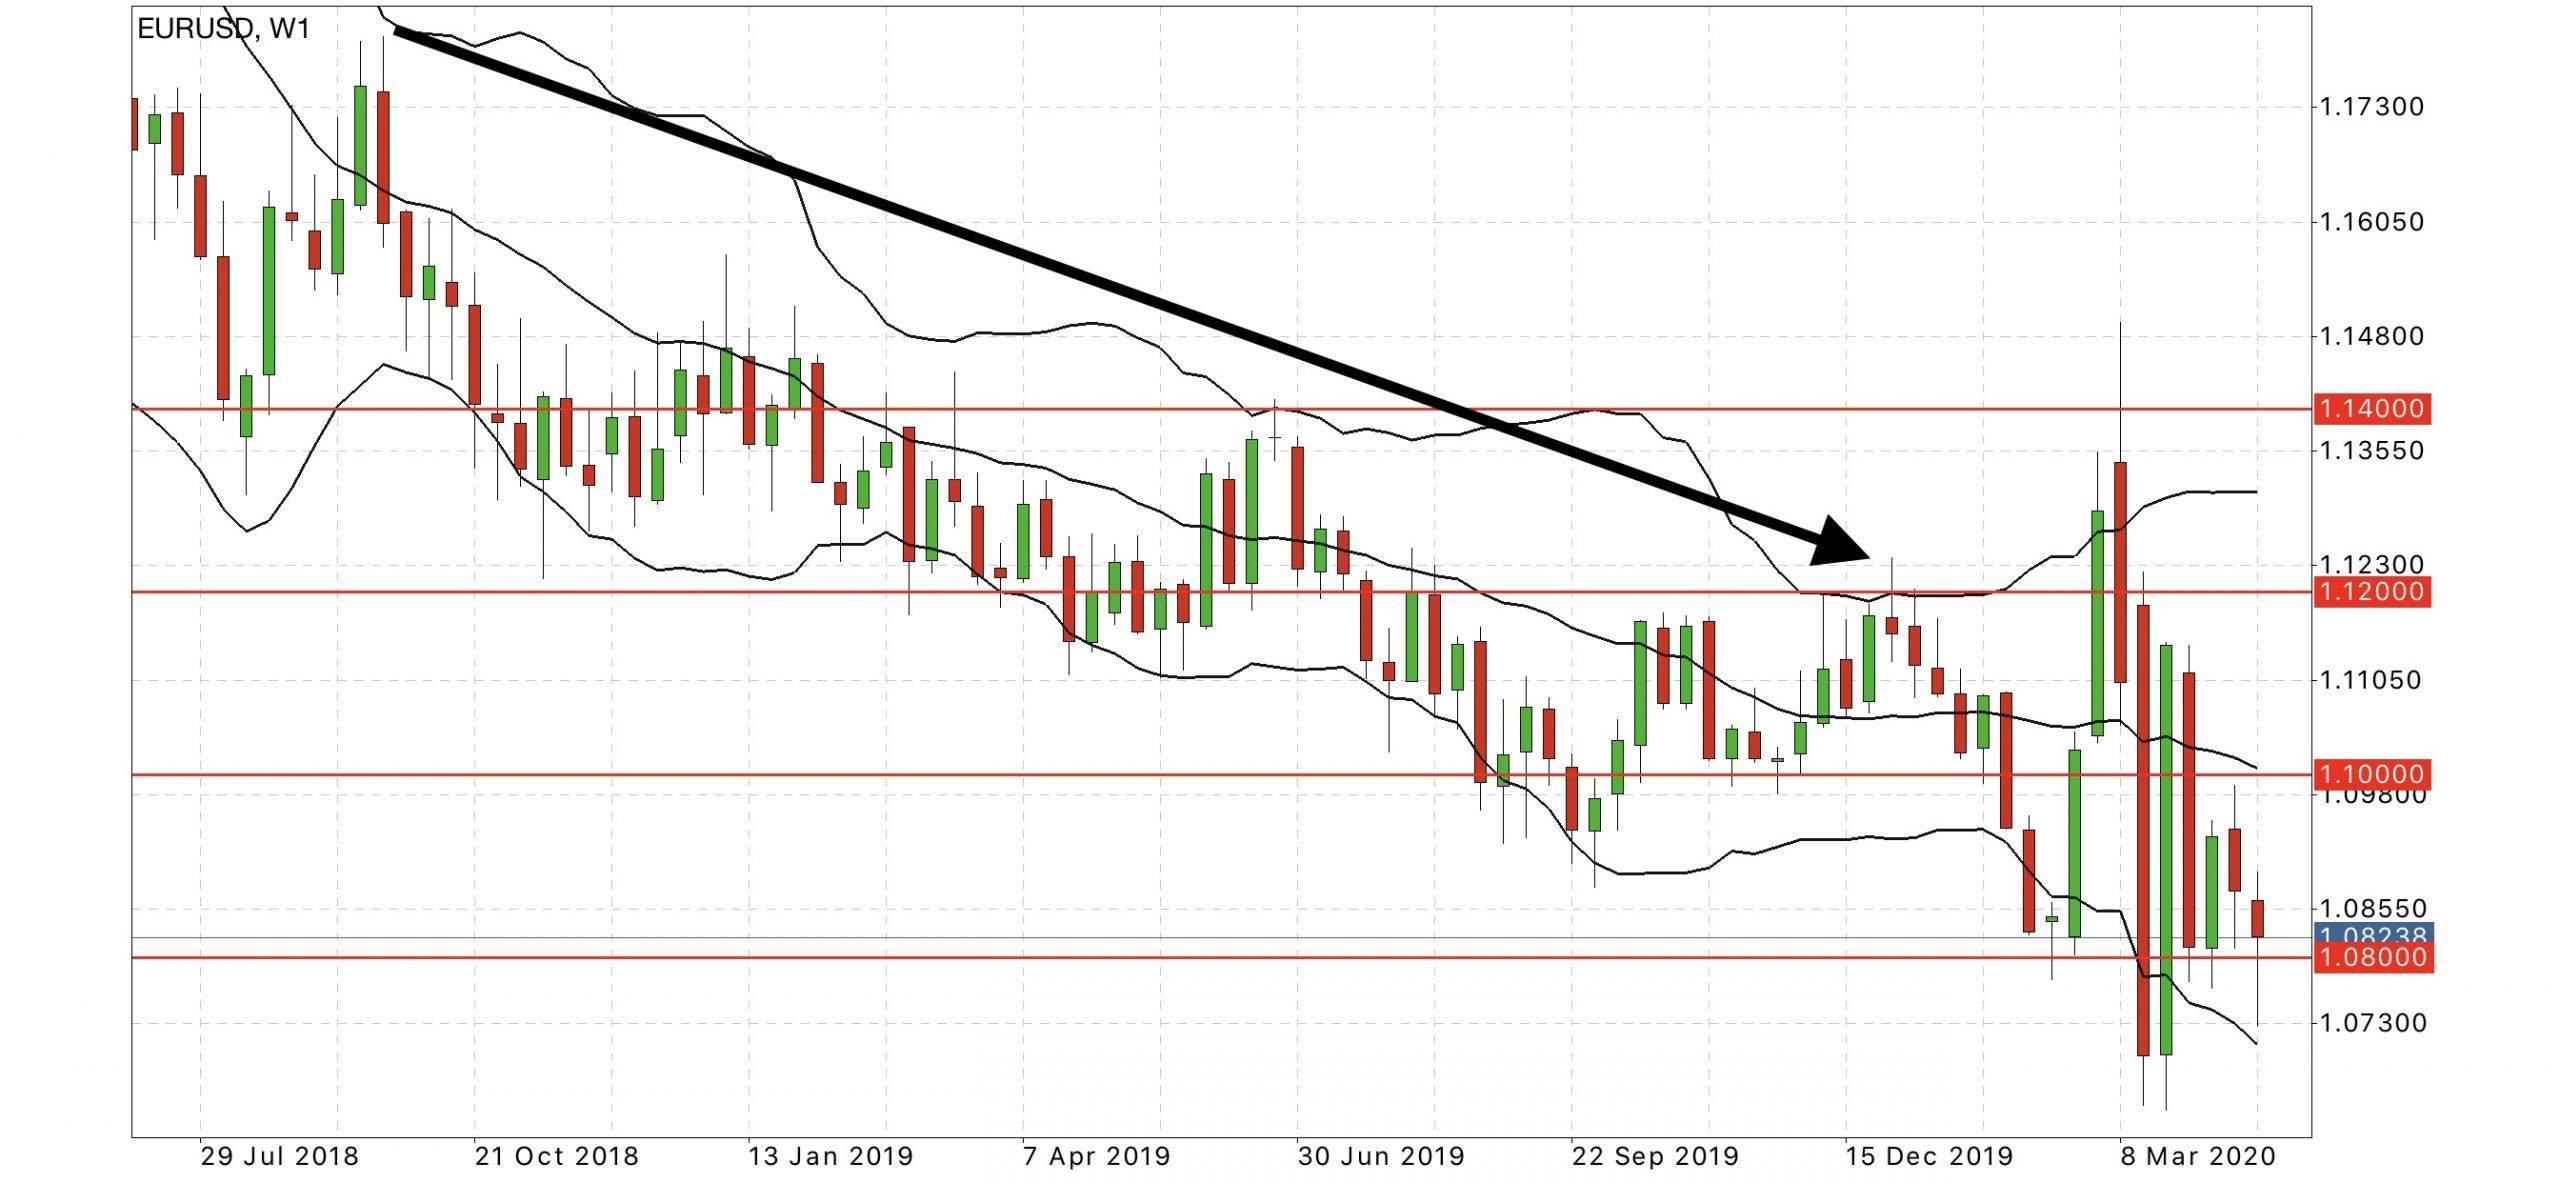 eurusd weekly forex forecast chart